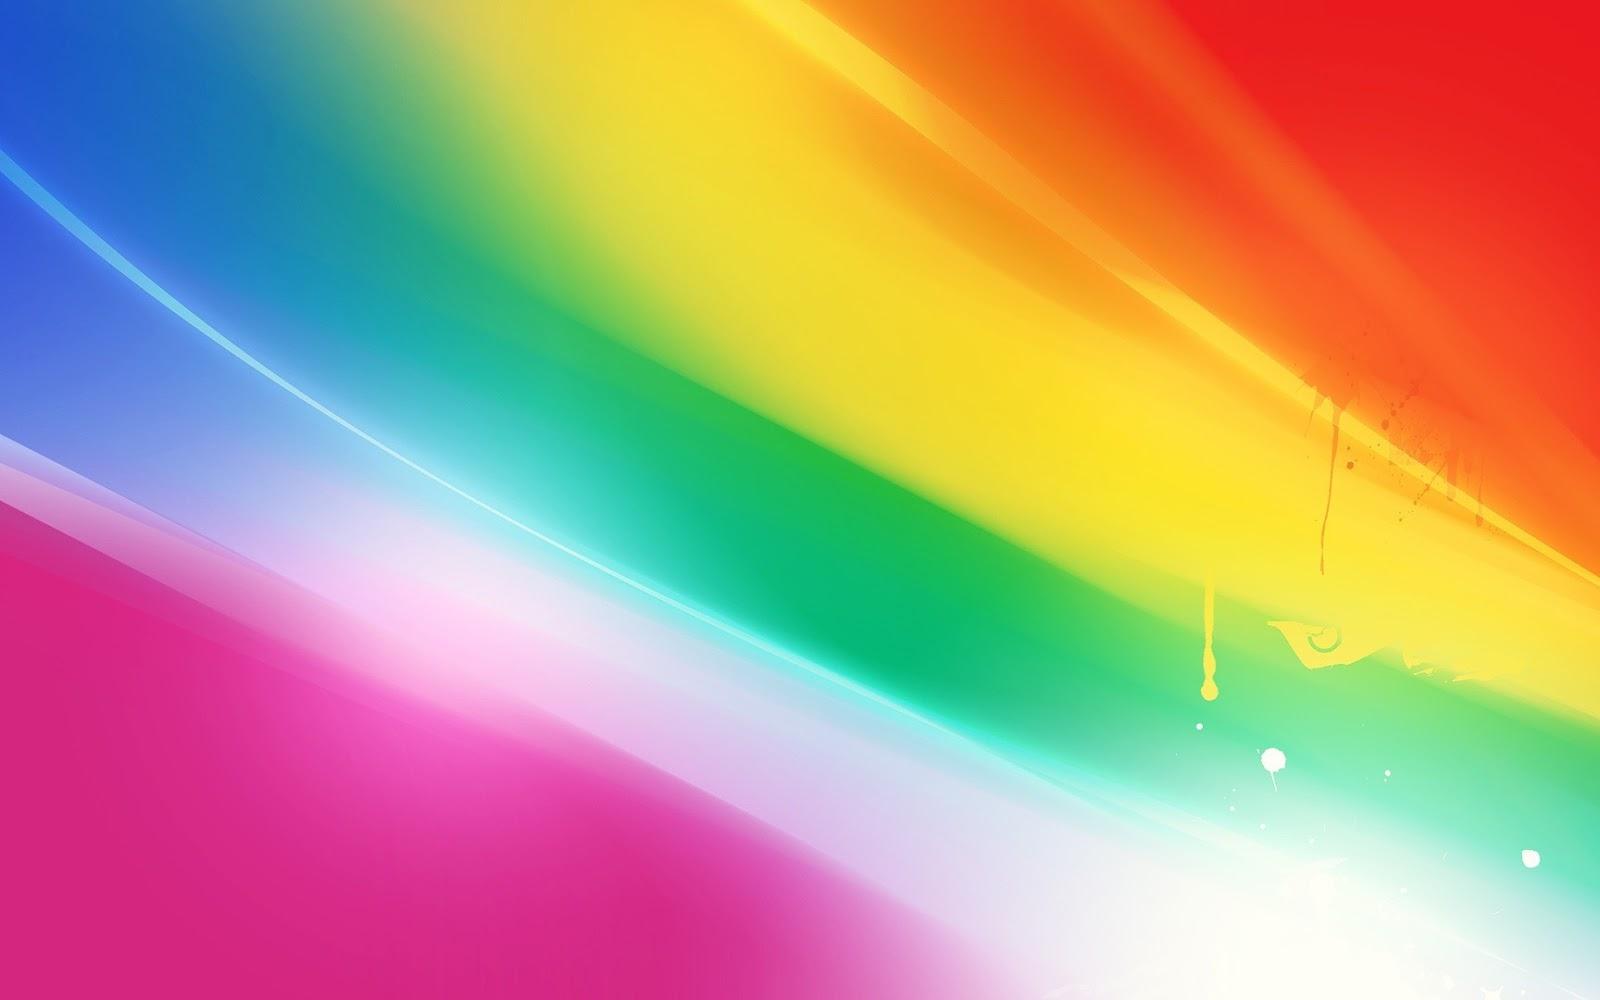 Hd bureaublad achtergronden bureaublad achtergronden - Felle kleuren ...